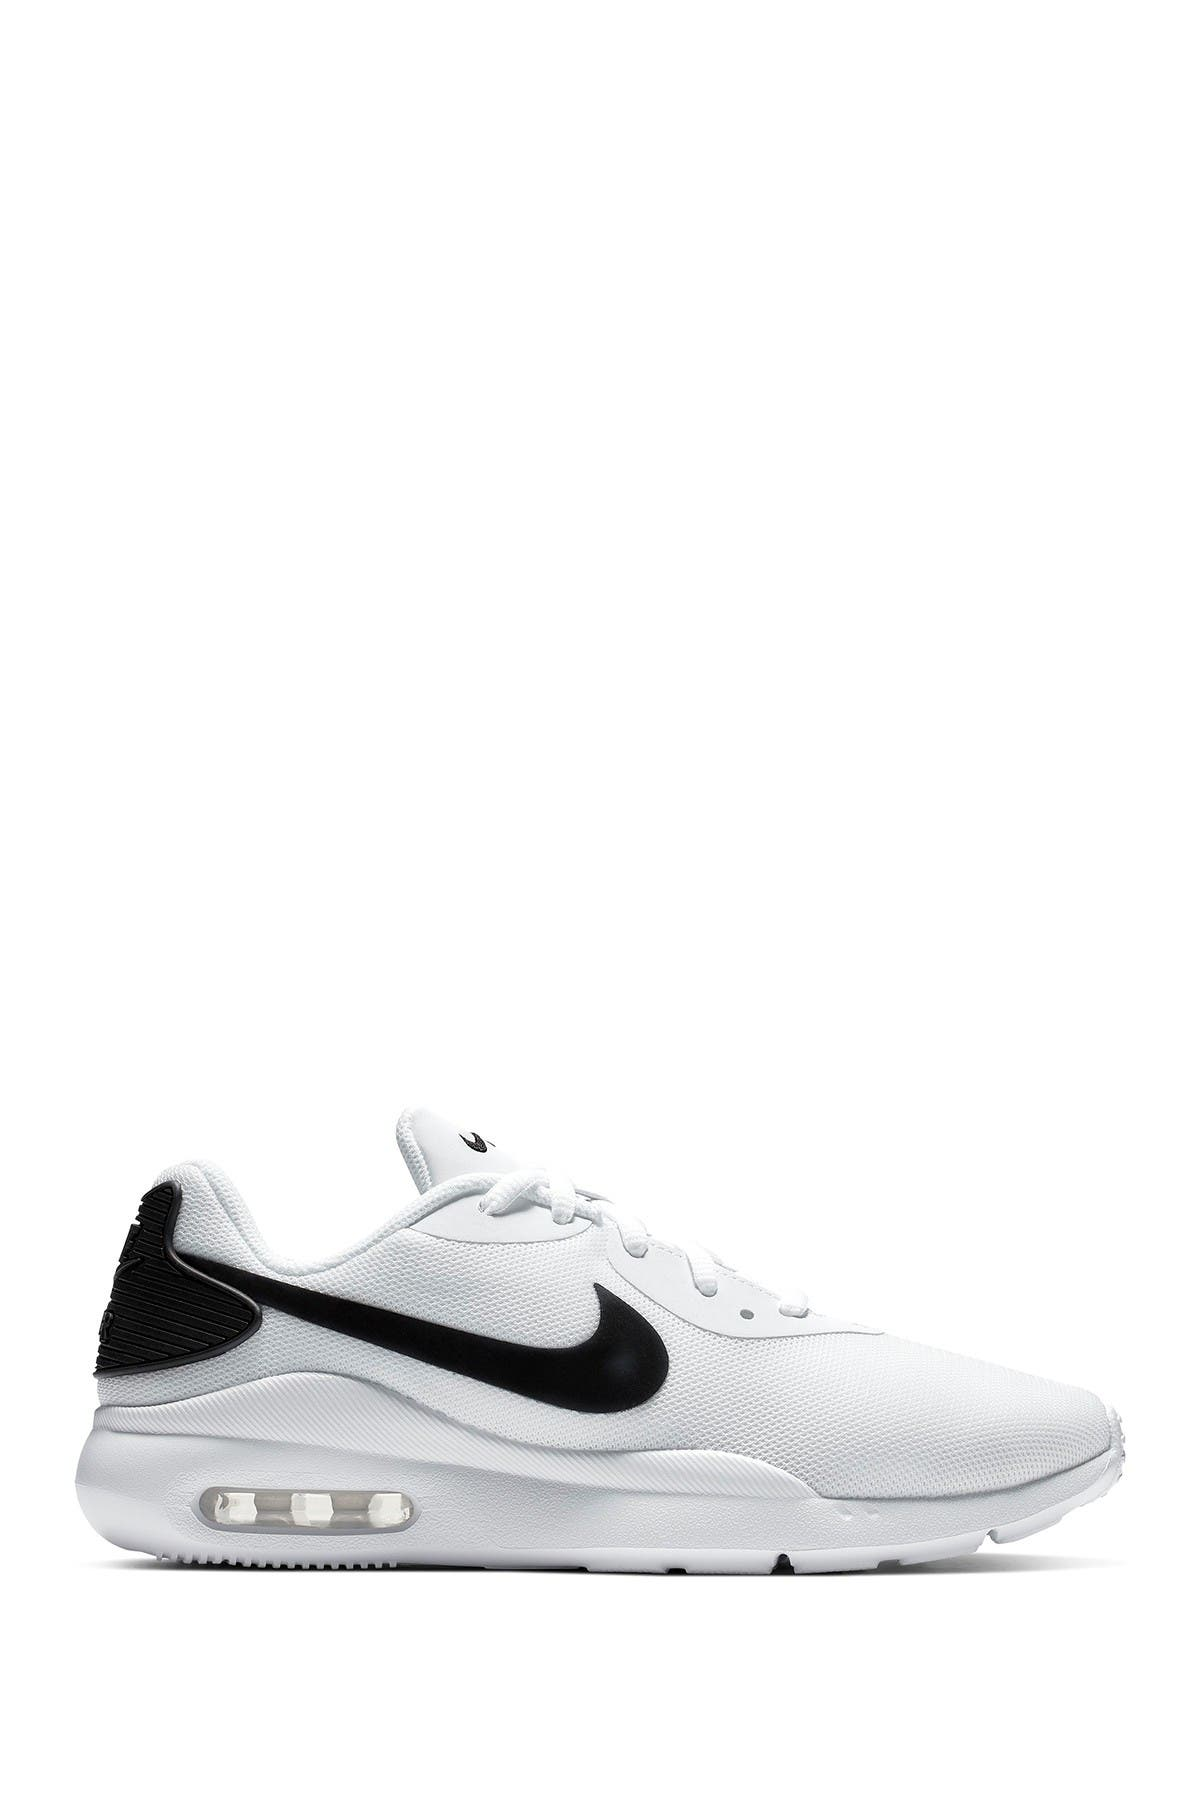 Nike | Air Max Oketo Sneaker